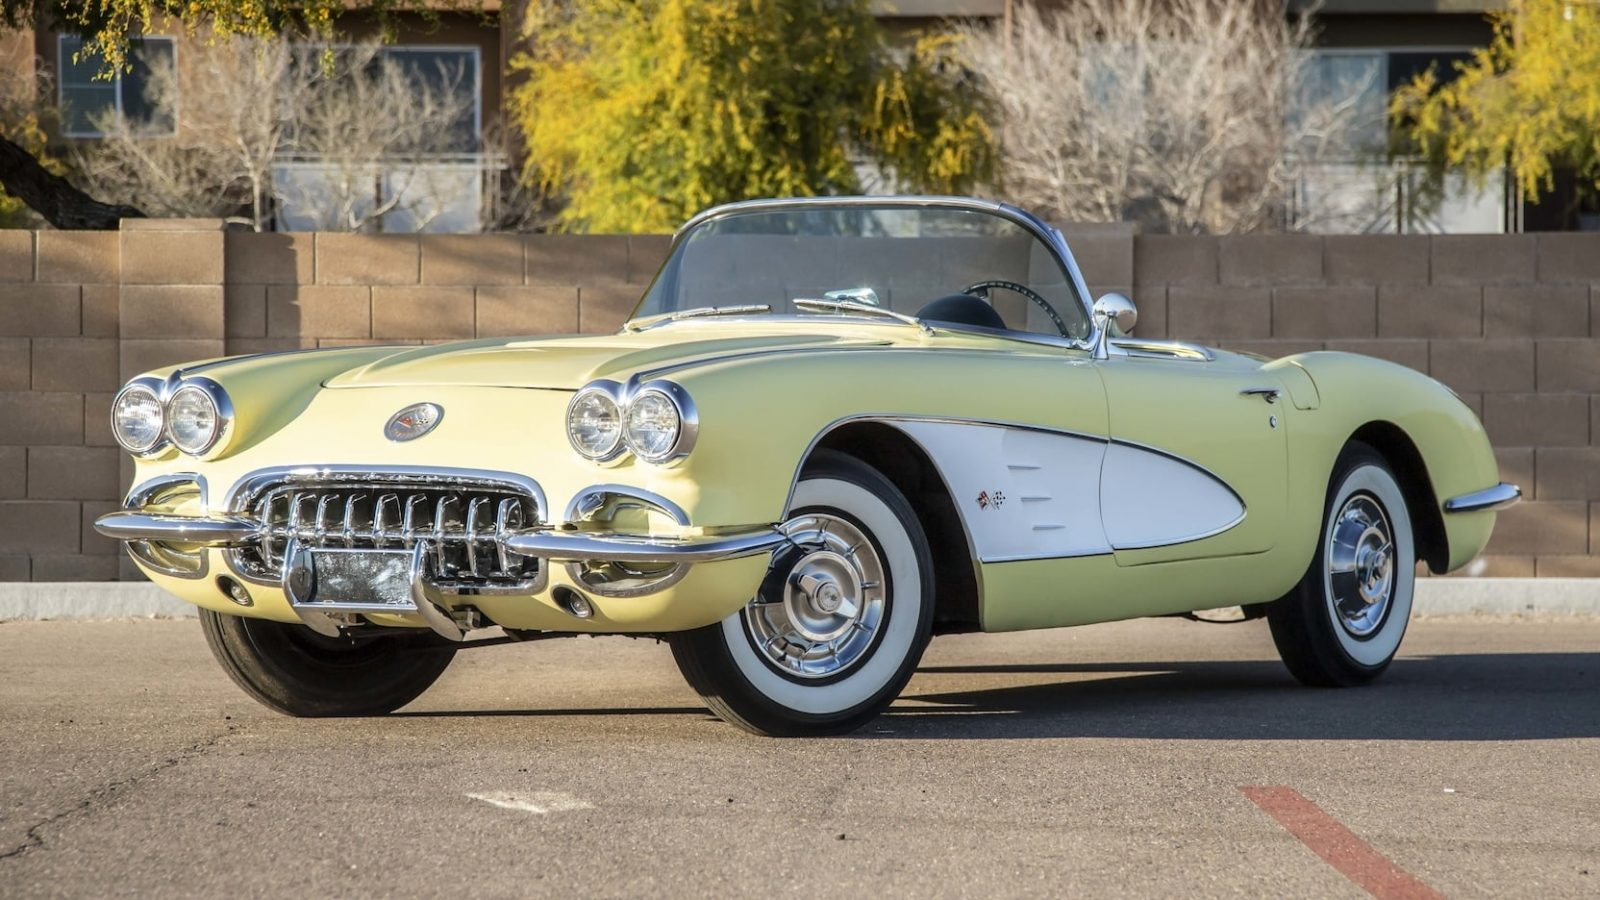 Фотографии автомобиля CHEVROLET CORVETTE CONVERTIBLE 1958 года.